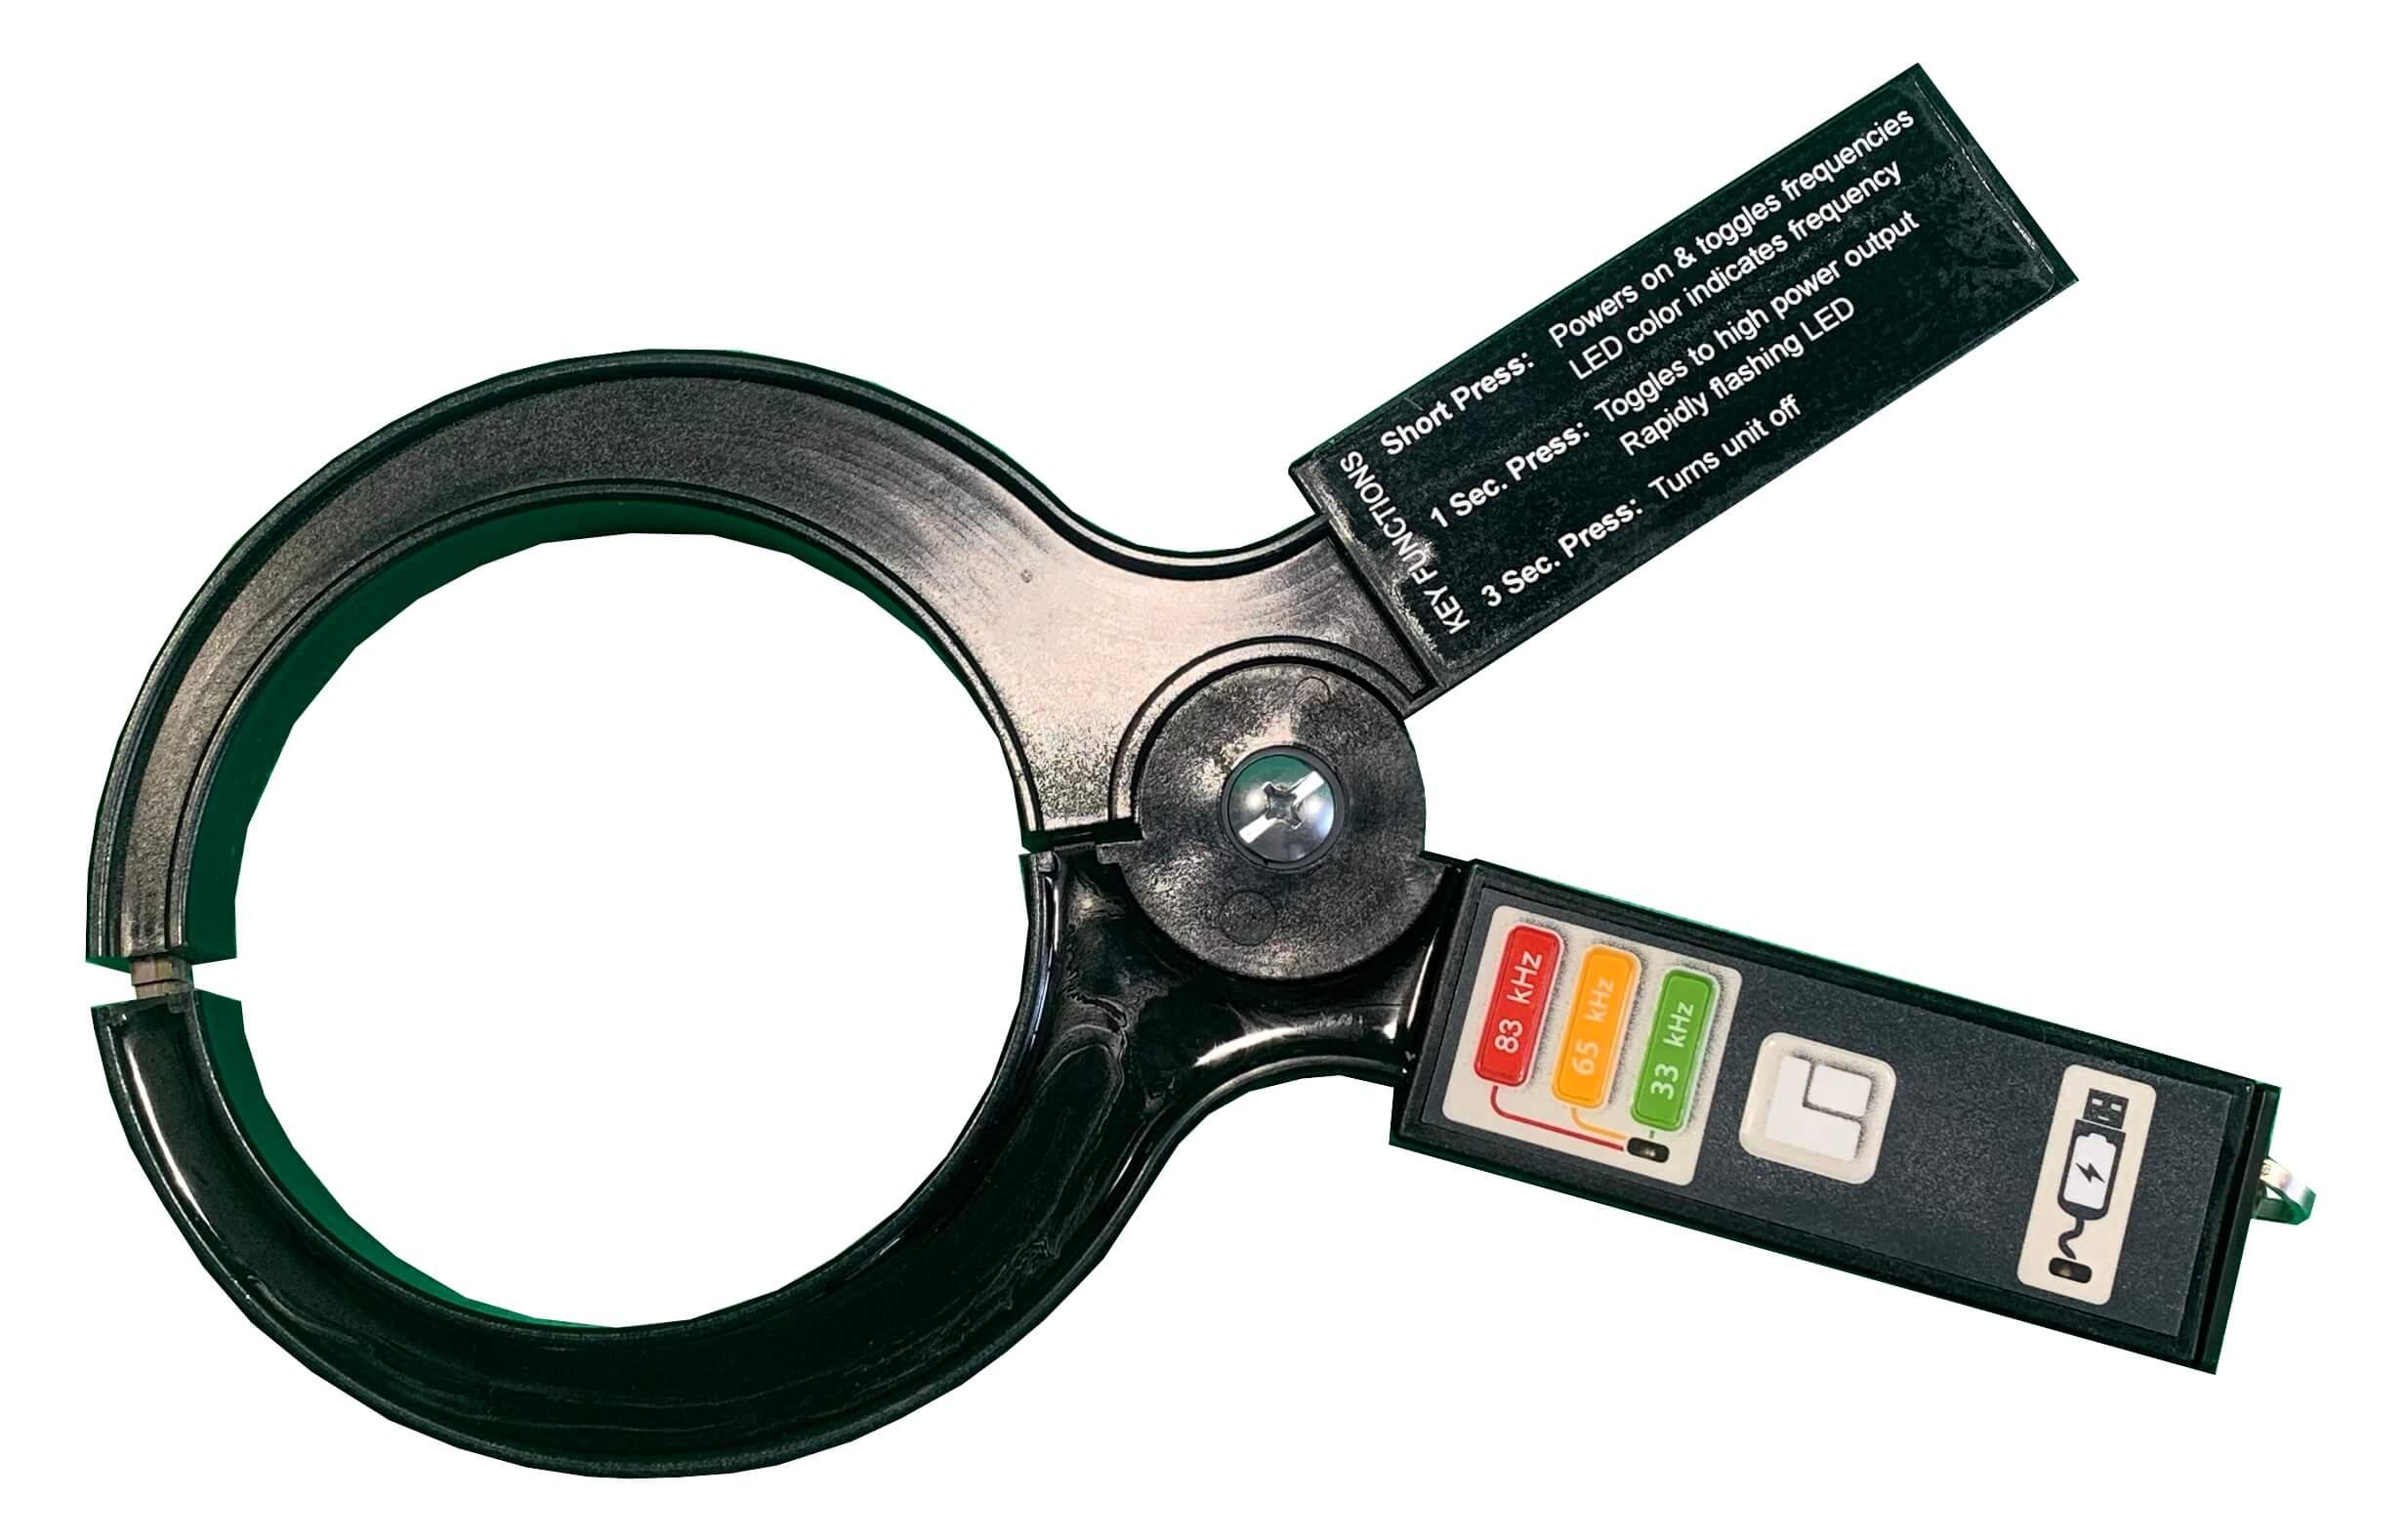 Rycom Clampmitter